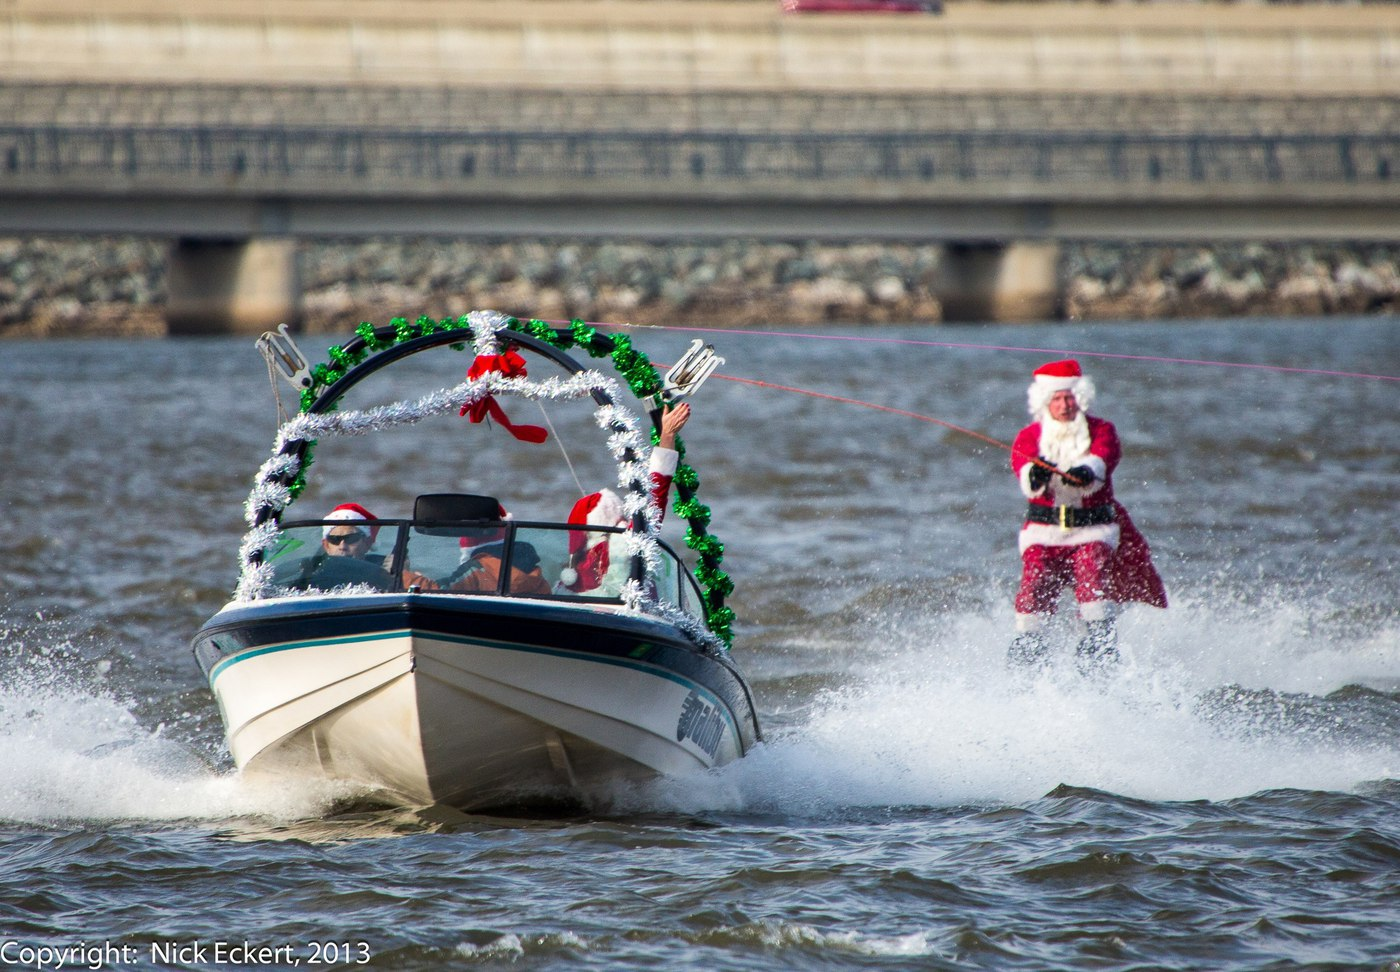 Waterskiing-Santa-CREDIT-Nick-Eckert_2100x1458_300_RGB